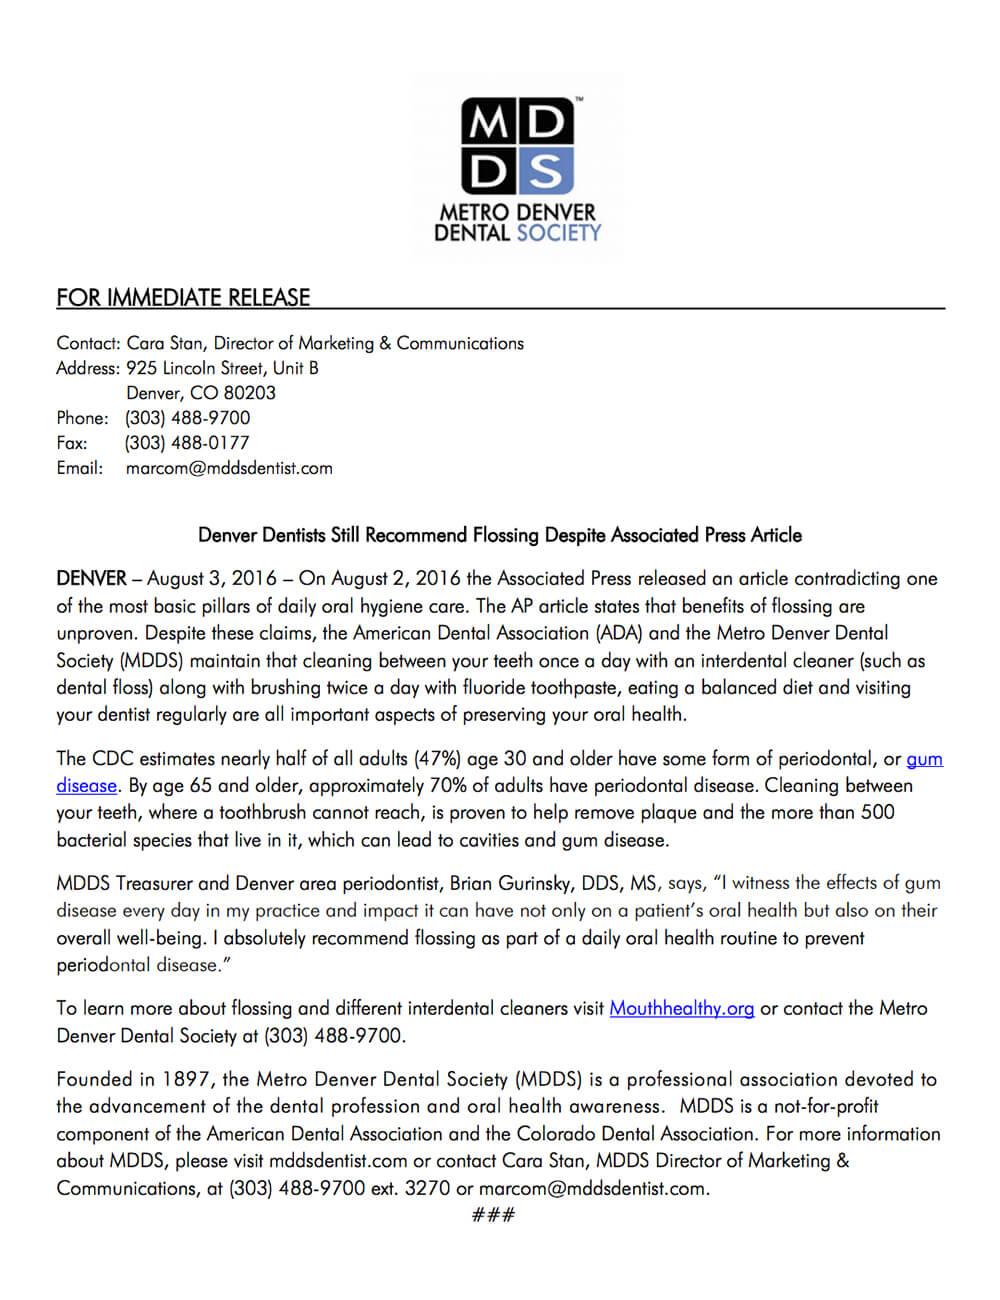 Press Release - Denver Dentists Still Recommend Flossing Despite Associated Press Article